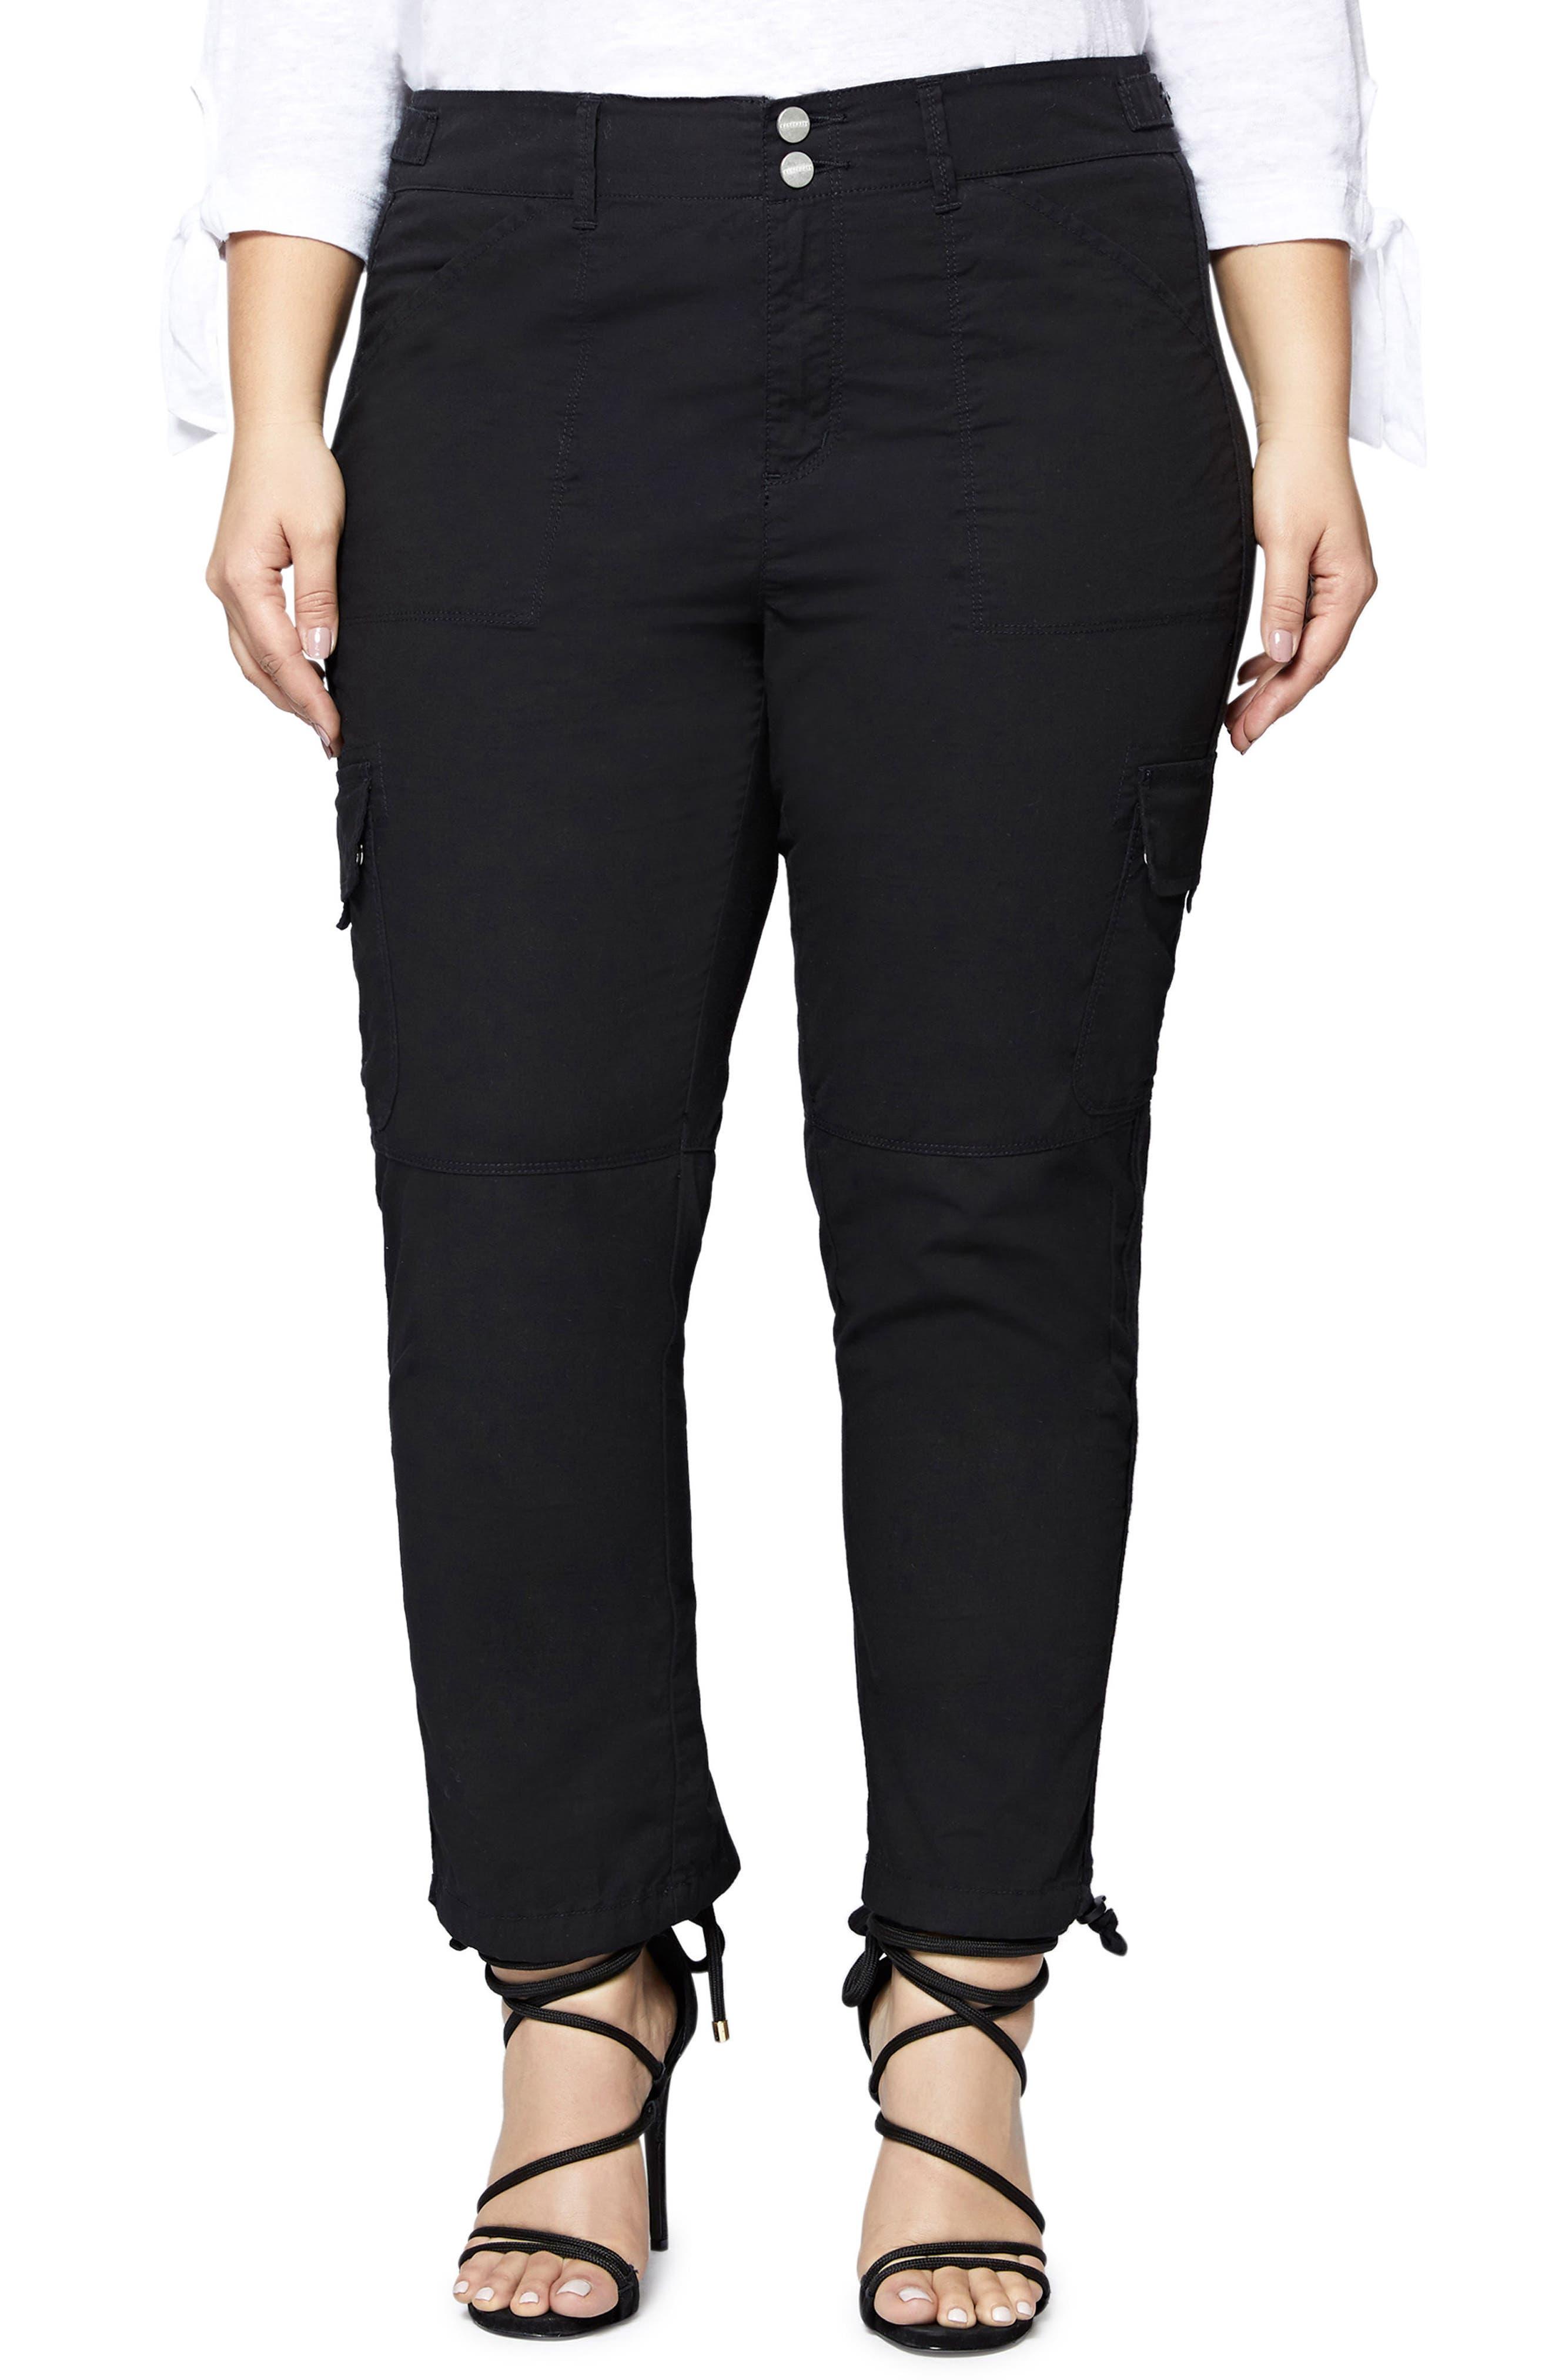 Terrain Crop Cargo Pants,                             Main thumbnail 1, color,                             Black